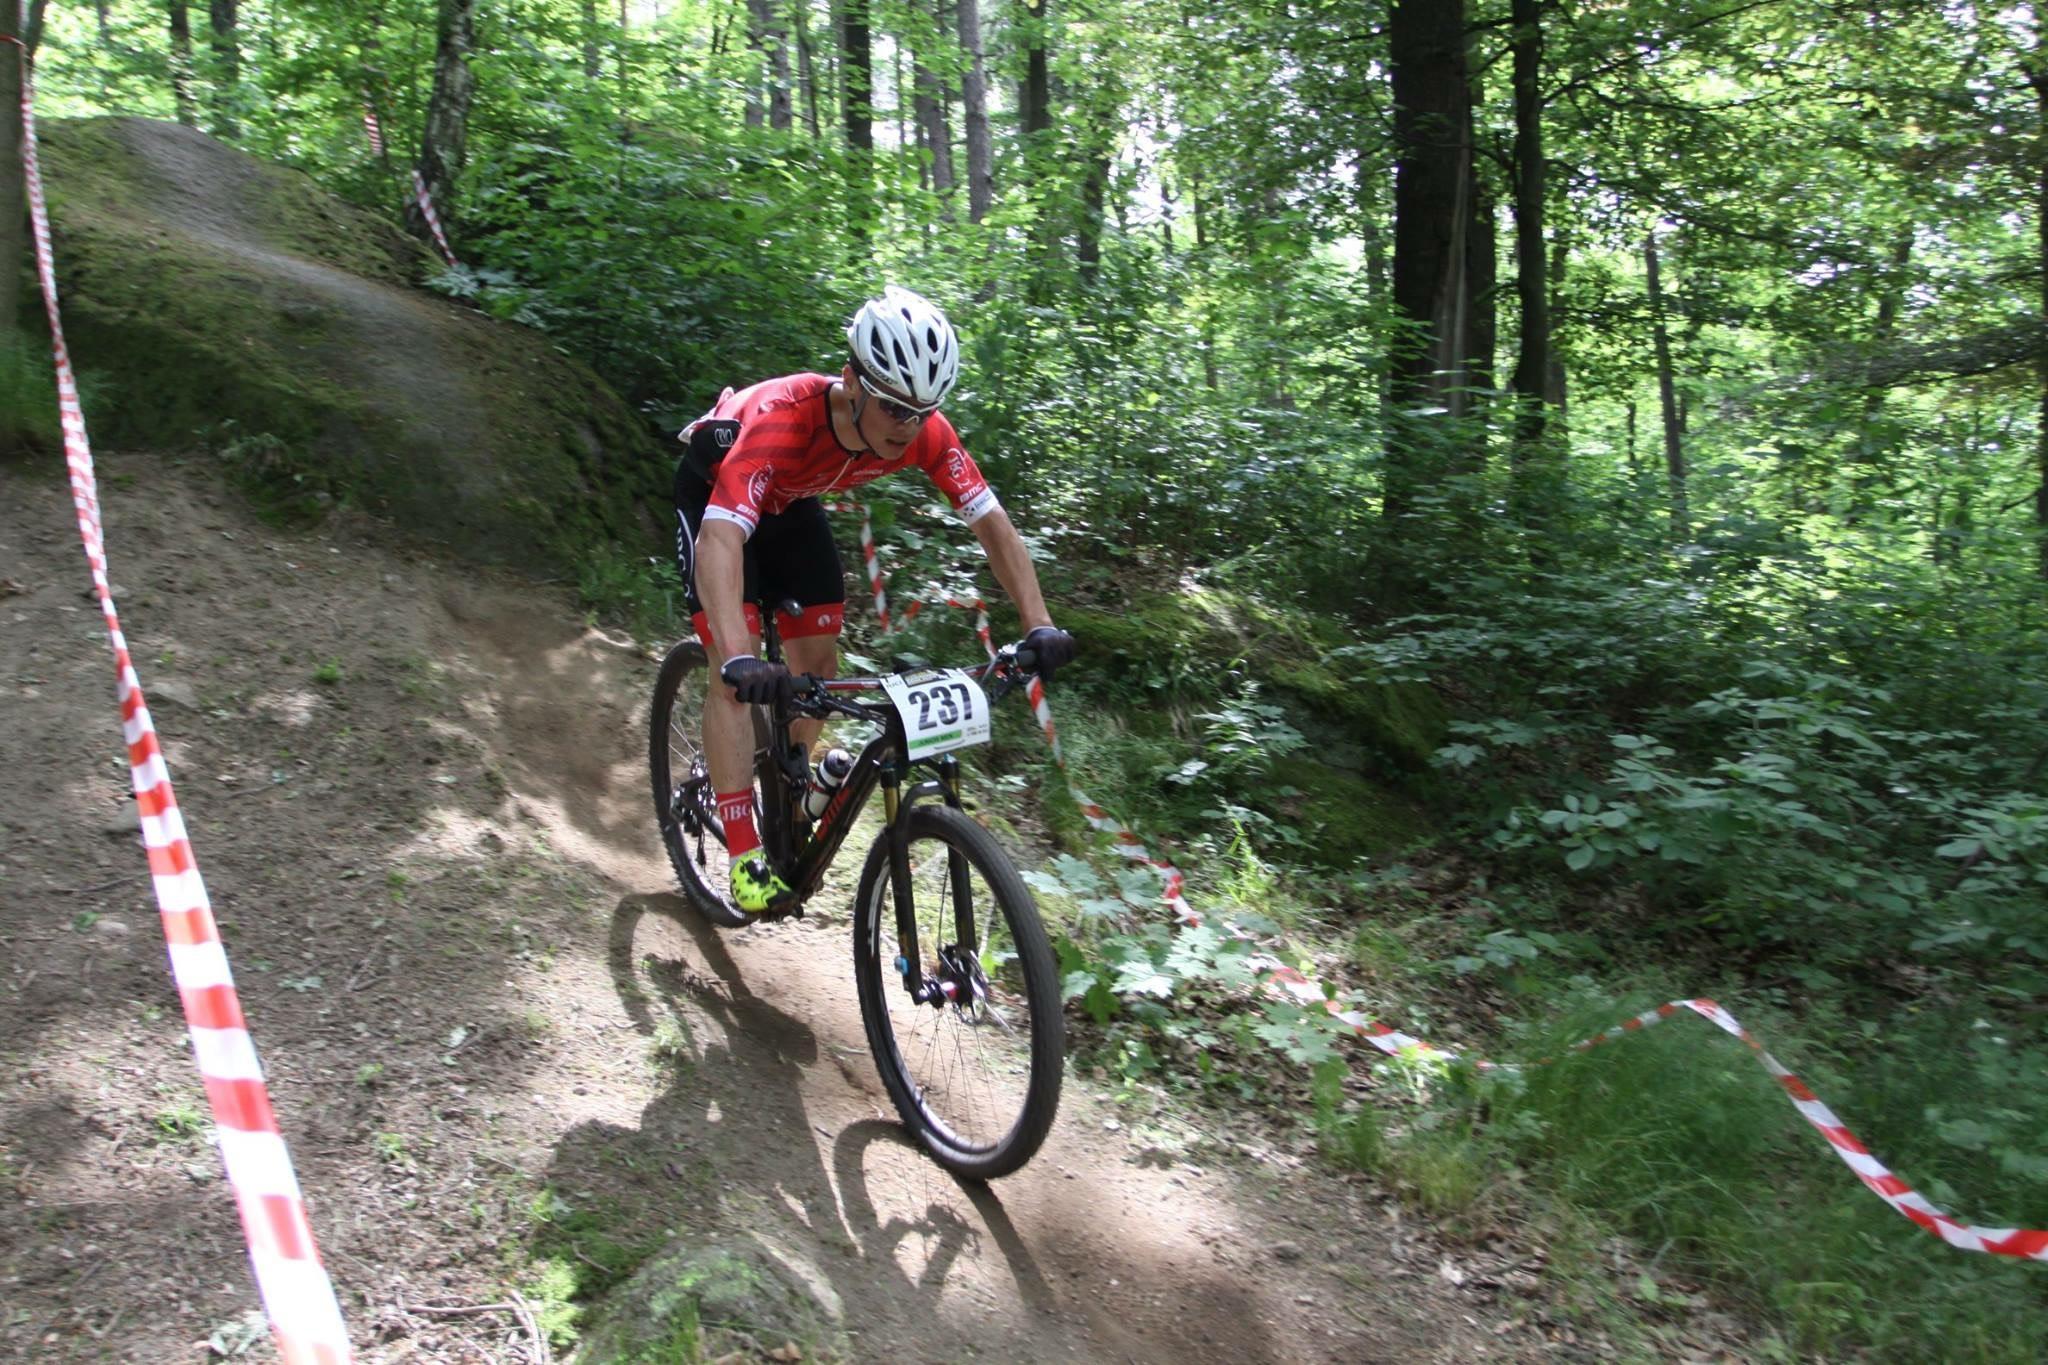 Mateusz Nieboras (JBG-2 Professional MTB Team) – Jelenia Góra Trophy UCI HC, Jelenia Góra